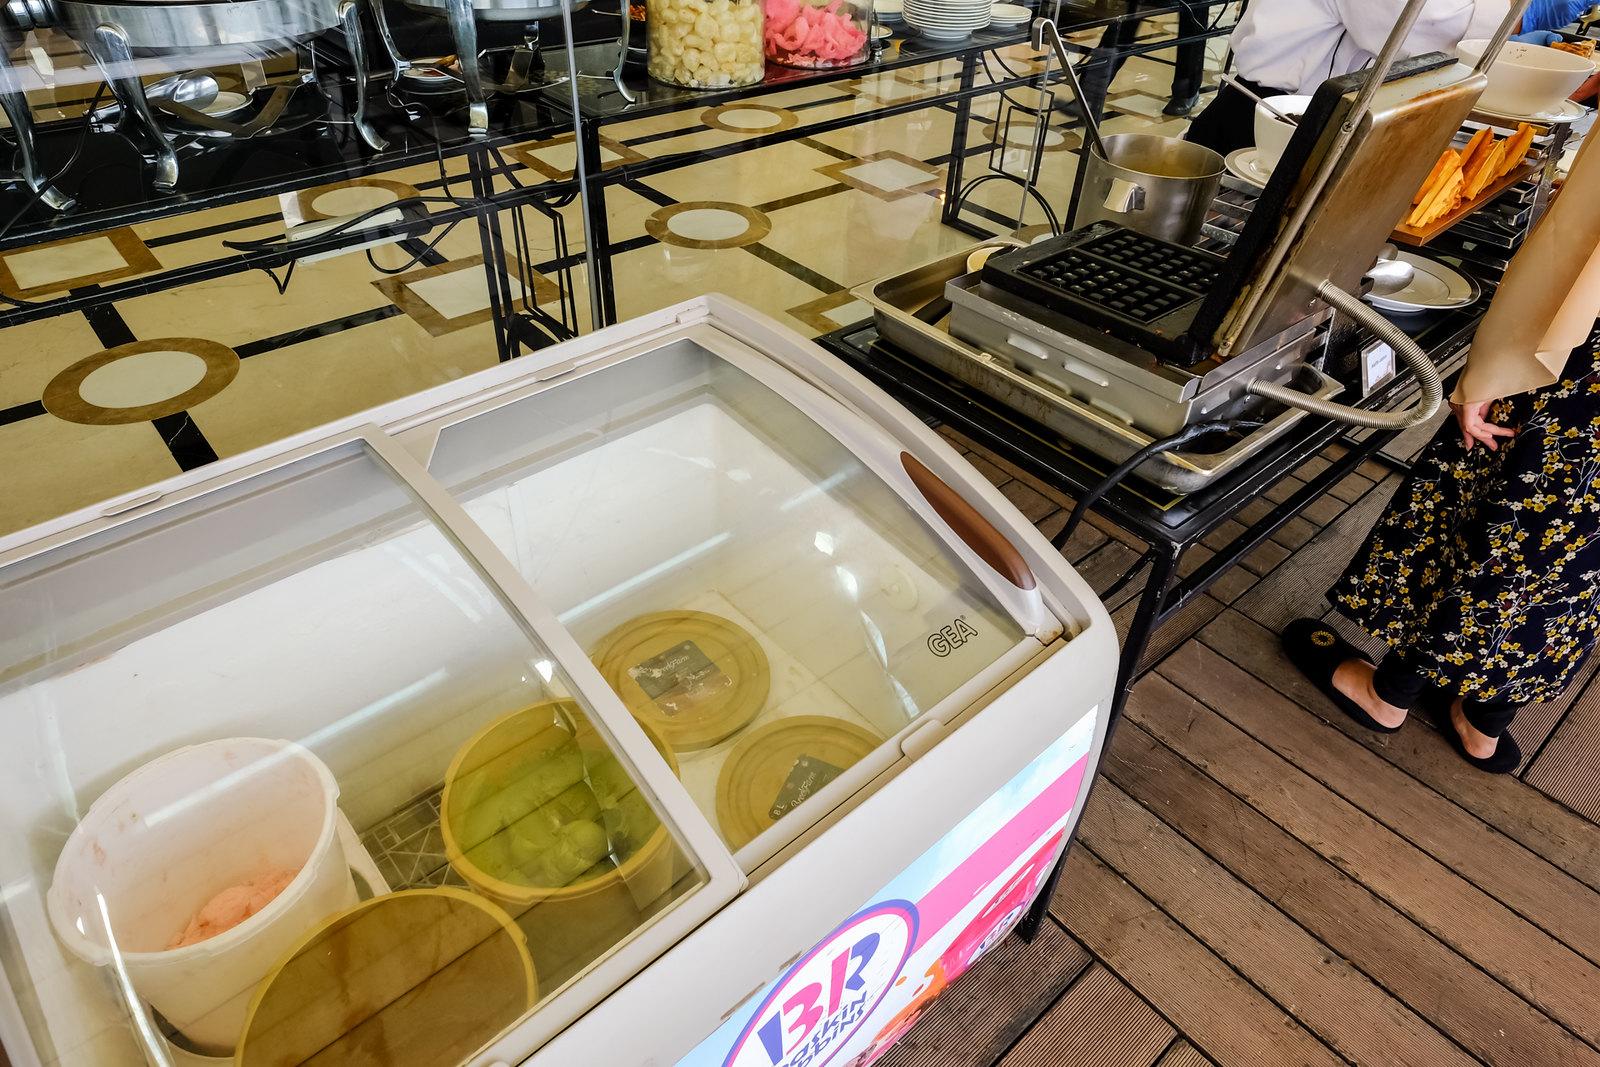 Ice cream section